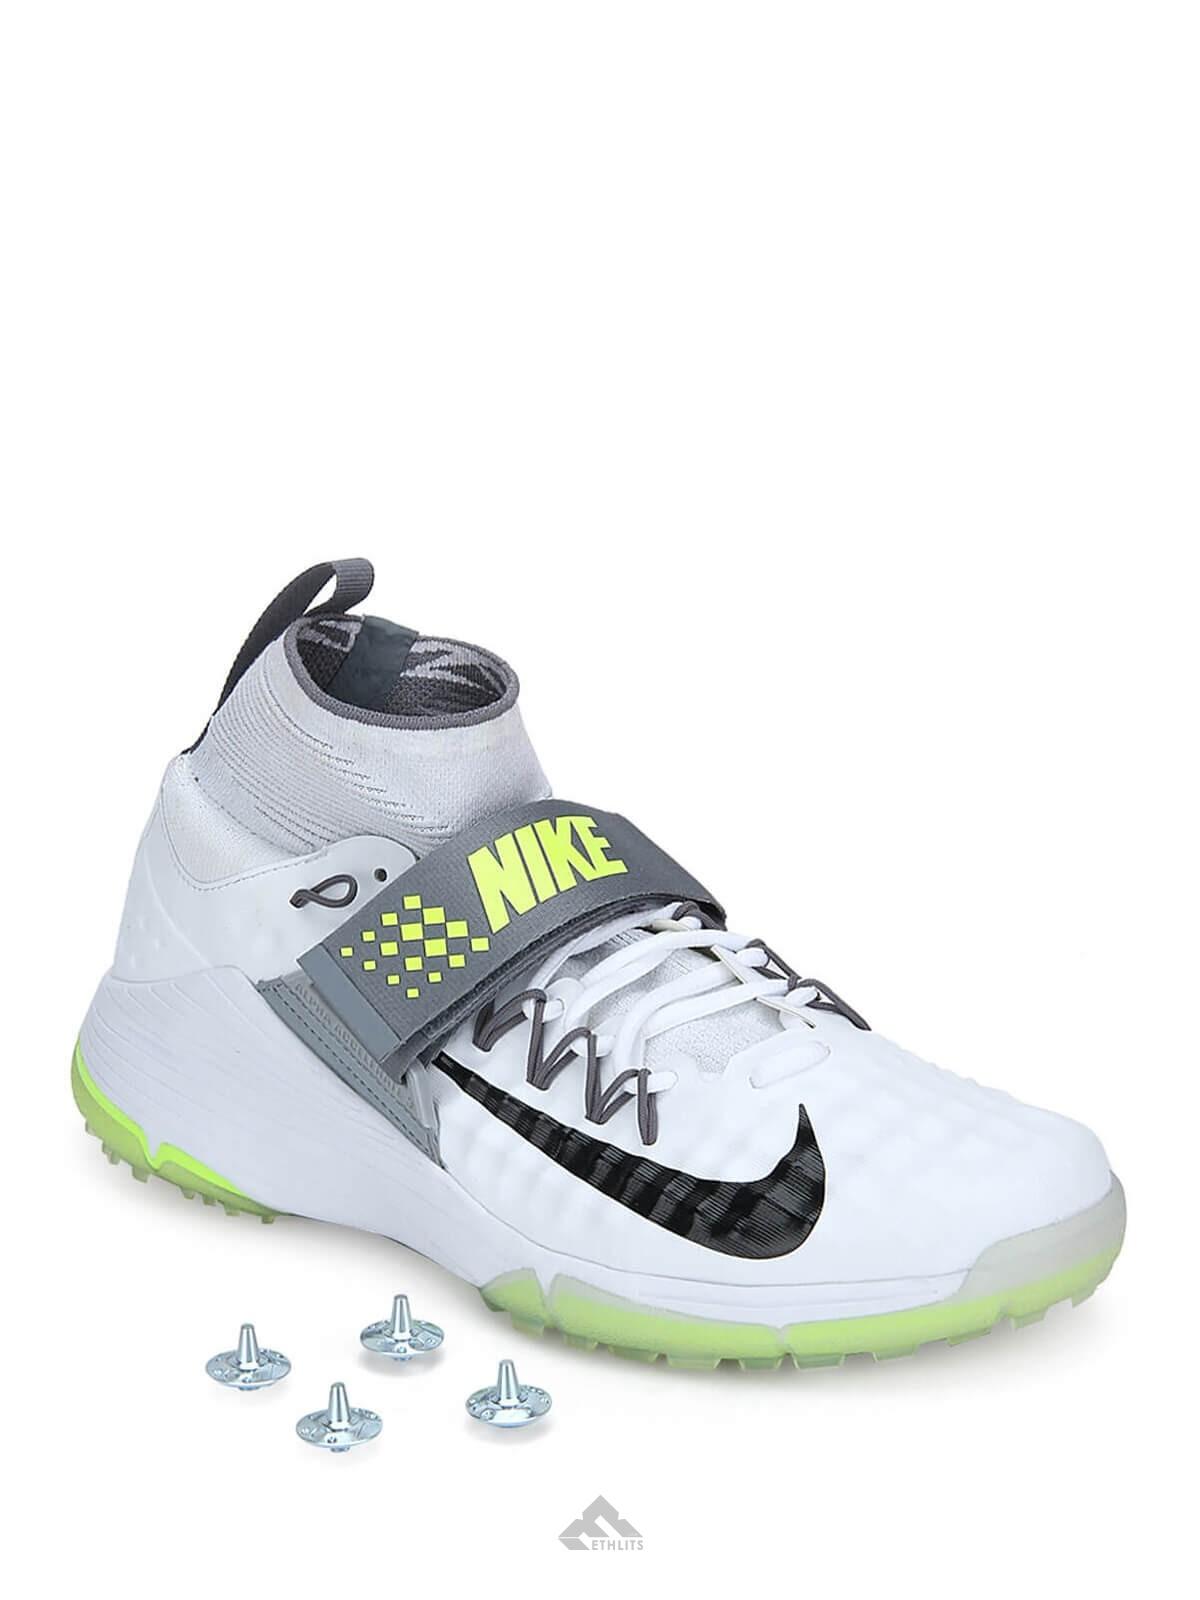 Buy Nike Alpha Accelerate 3 White/Black